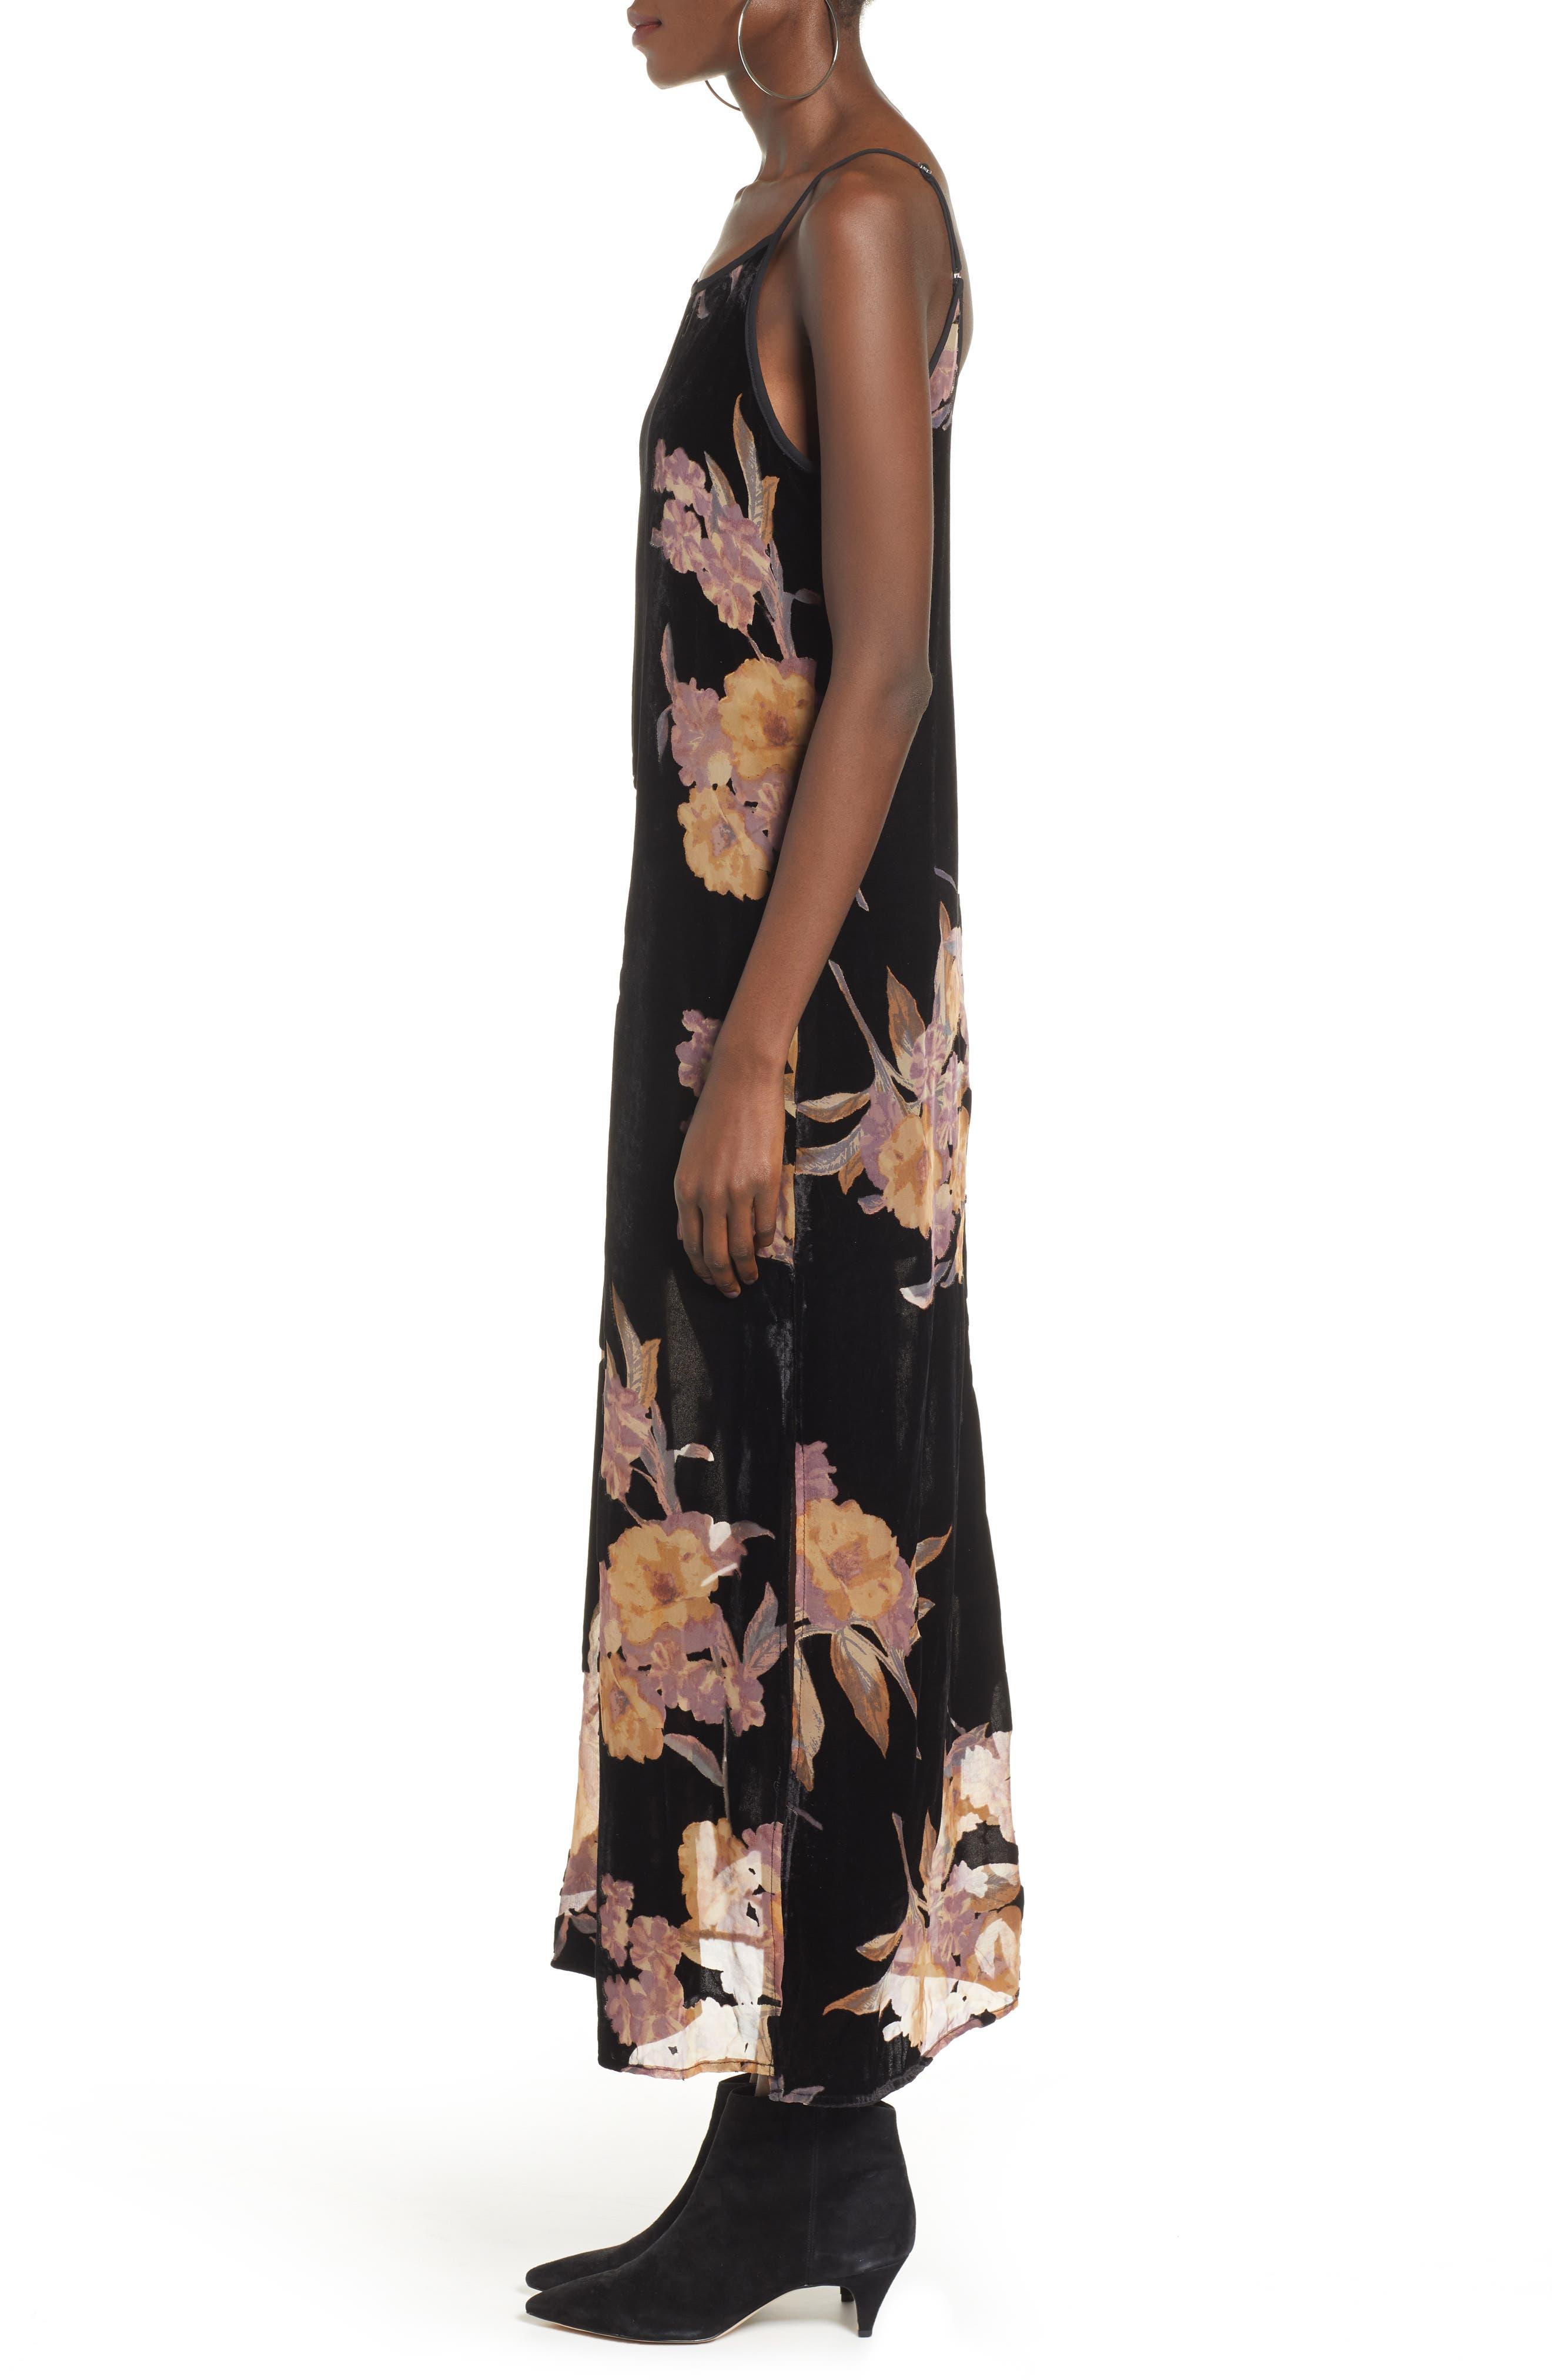 BAND OF GYPSIES,                             Mallorey Floral Print Velvet Dress,                             Alternate thumbnail 3, color,                             001